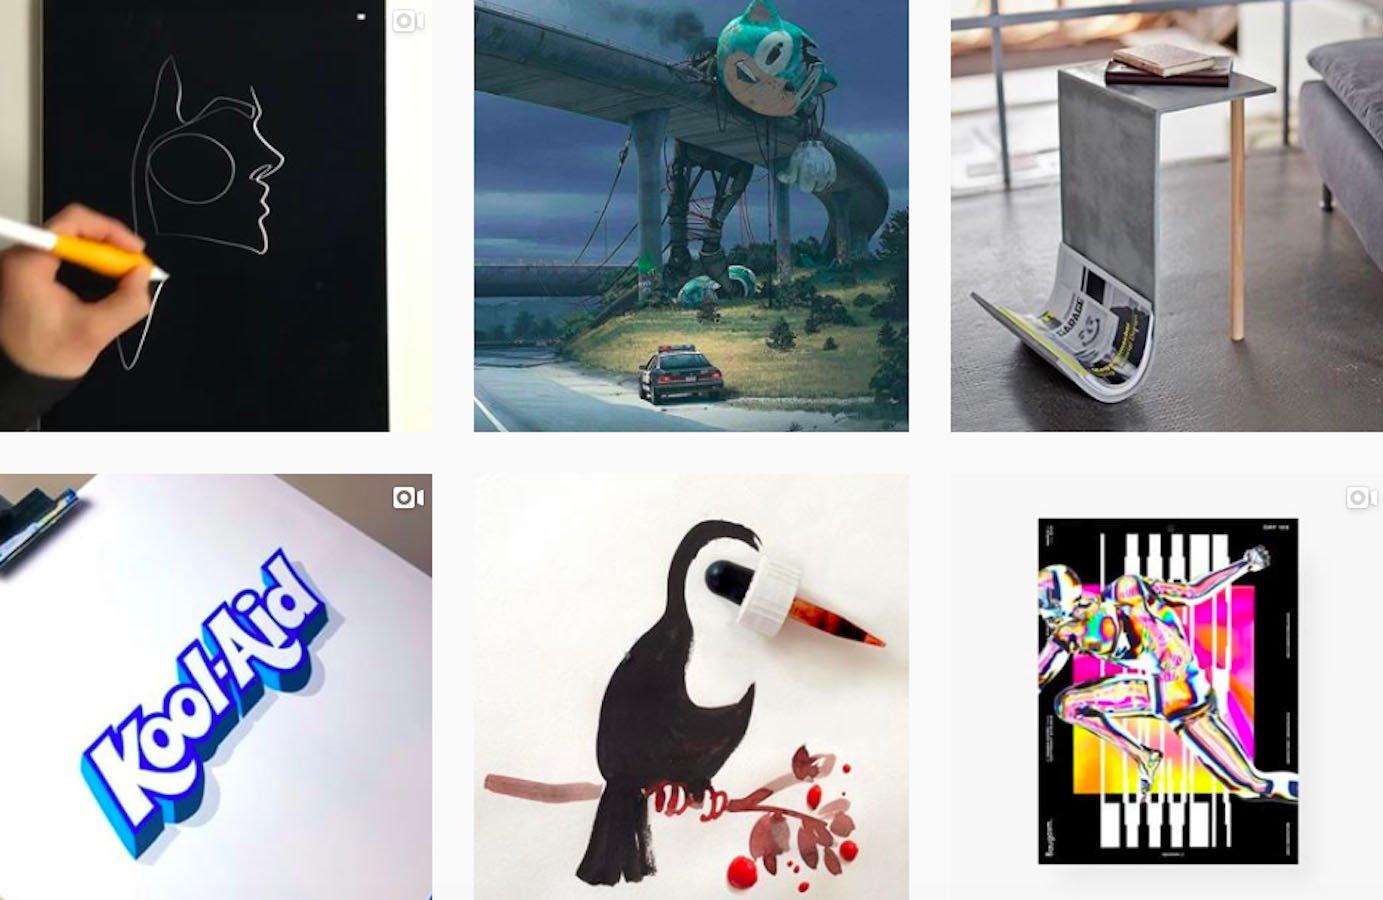 Web Design Inspiration: 110+ Accounts On Instagram and 10+ Best UX & Web Design Books in 2020 - usemuzli